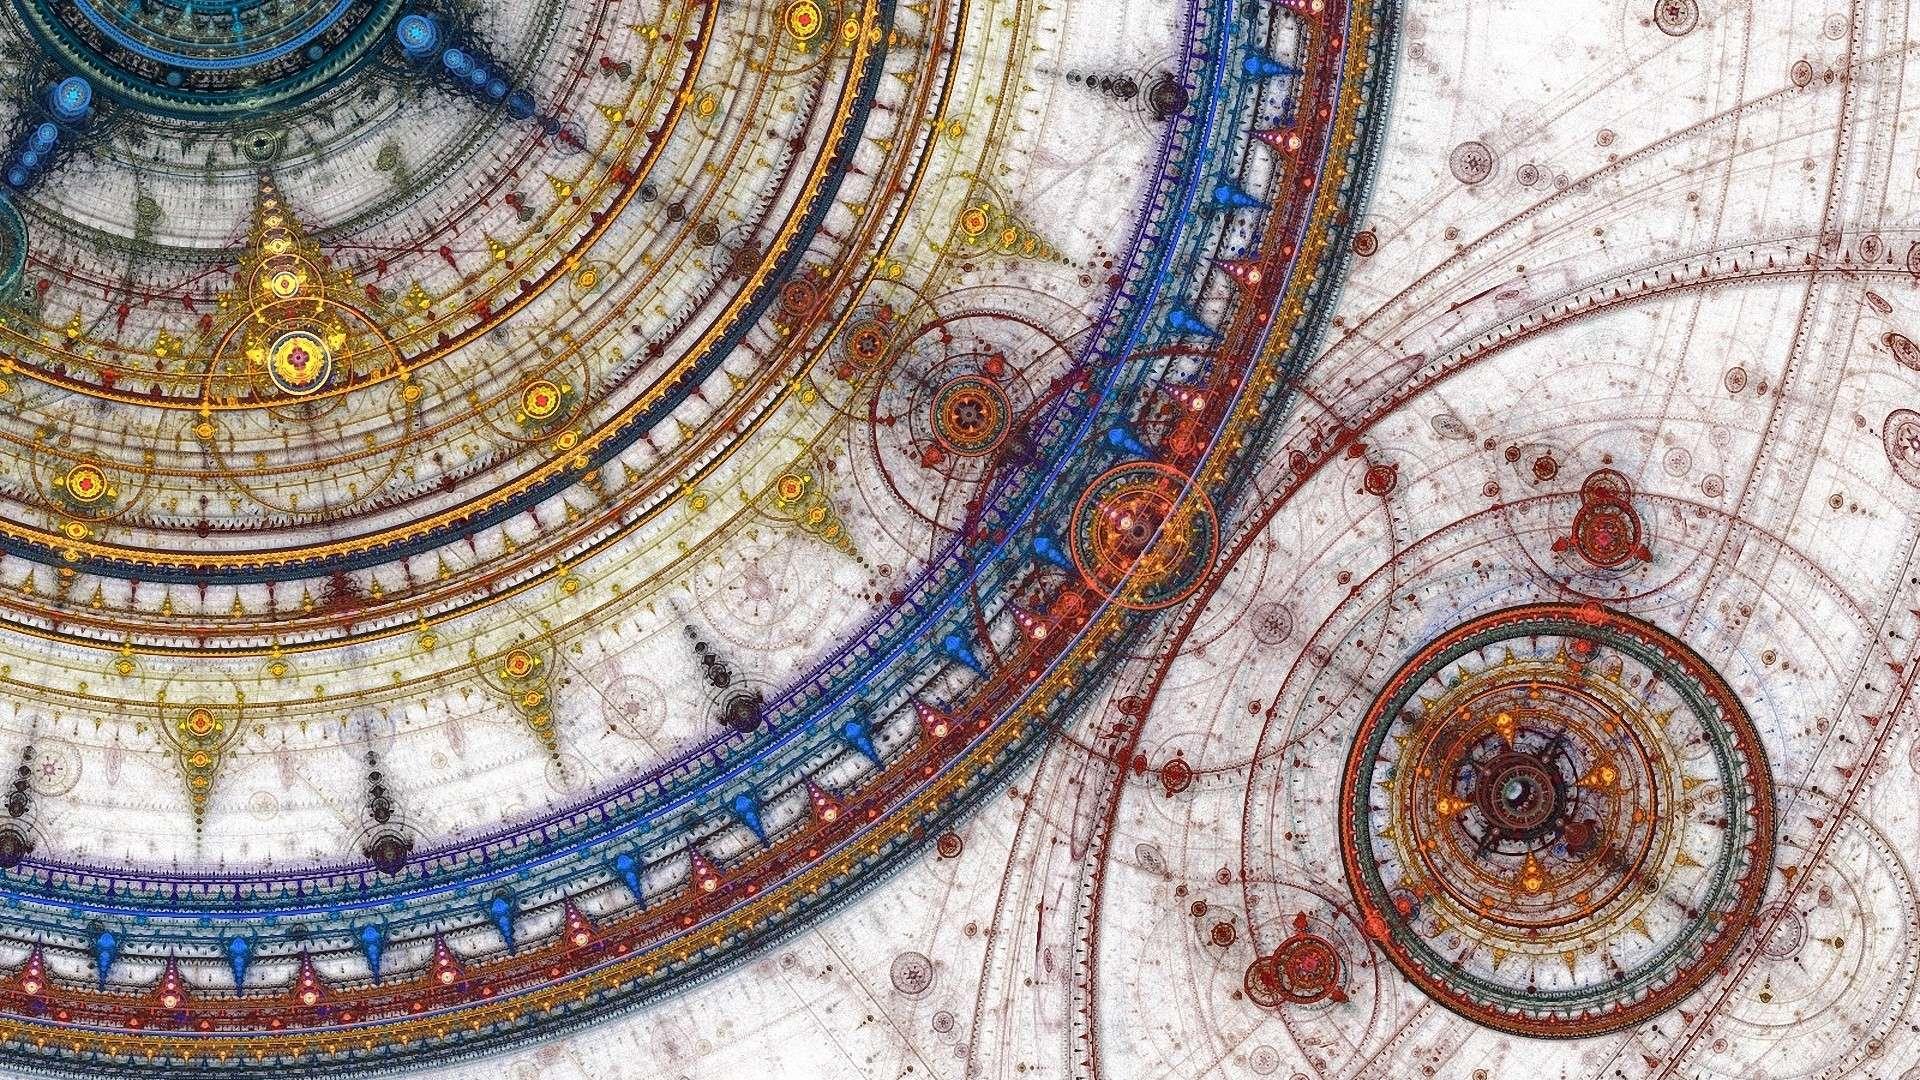 50 Fractal Wallpaper Pictures